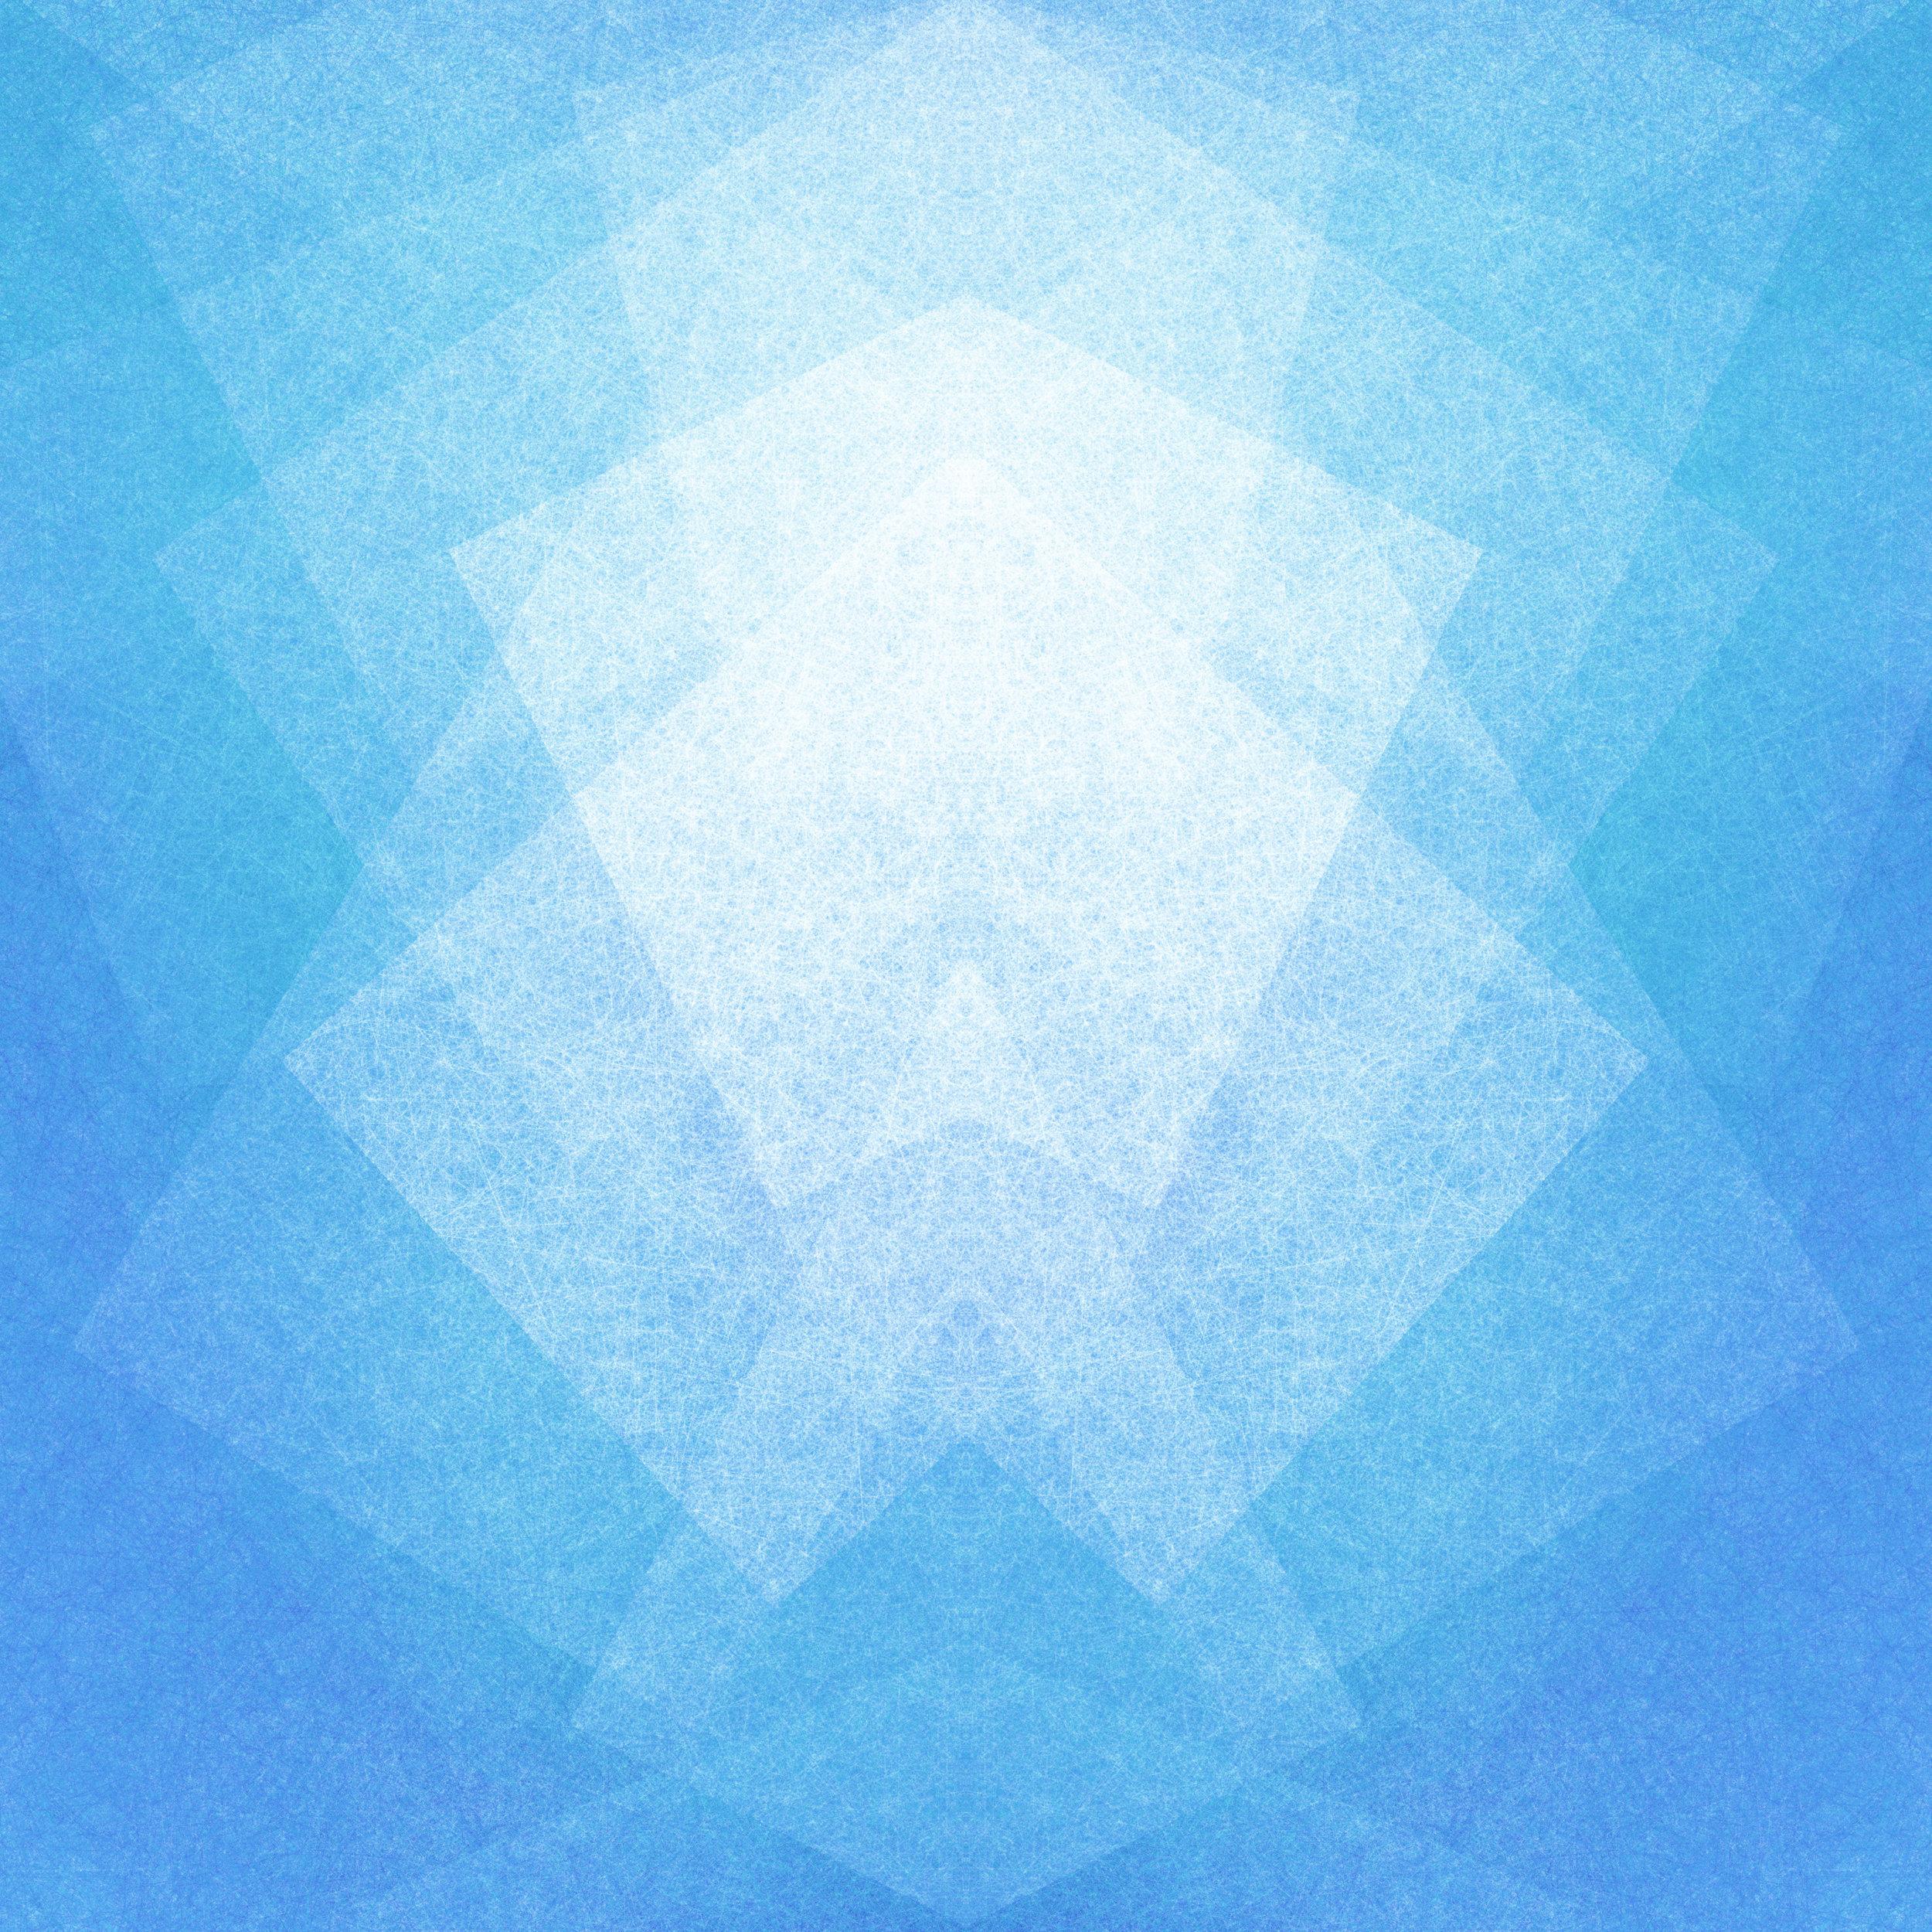 Blue_Background_104134300_3.jpg